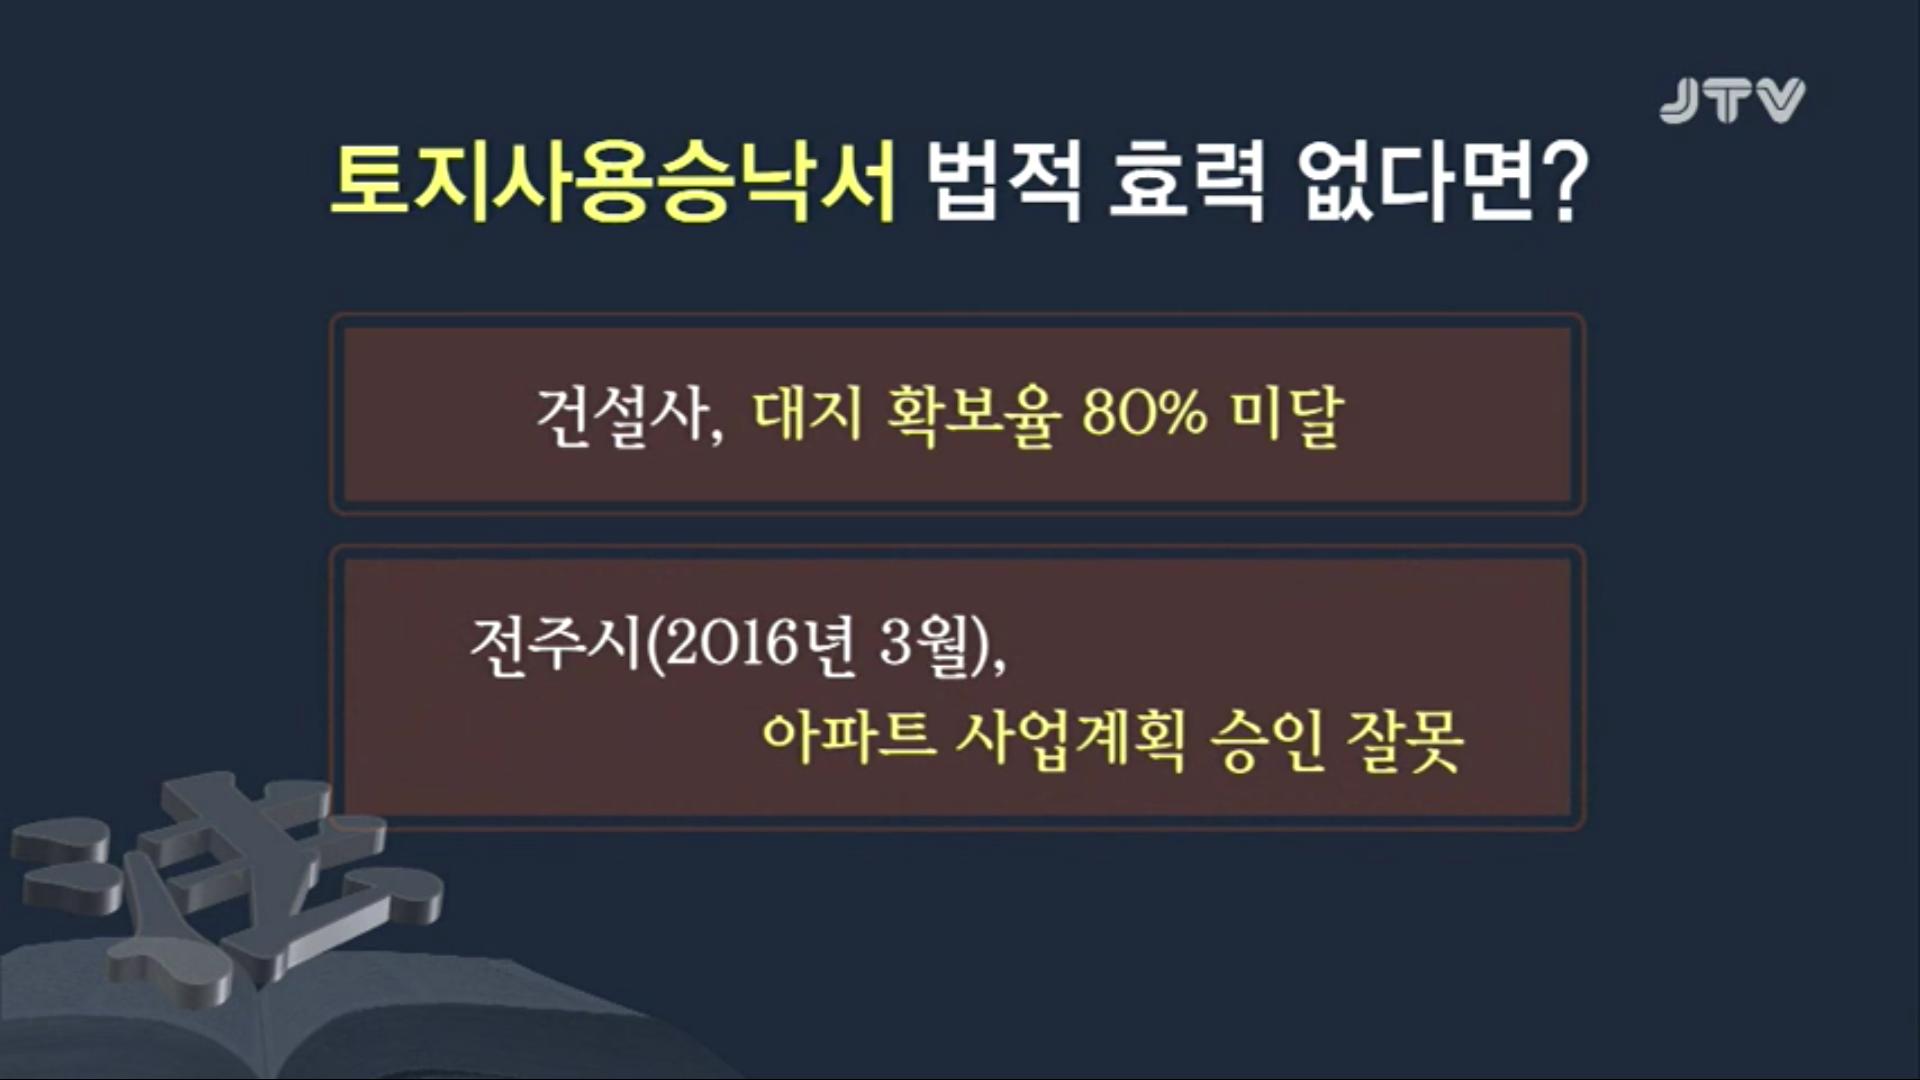 [19.5.3 JTV 현장스토리 판] 고소, 고발 당한 전주시장... 미심쩍은 건축행정2.png